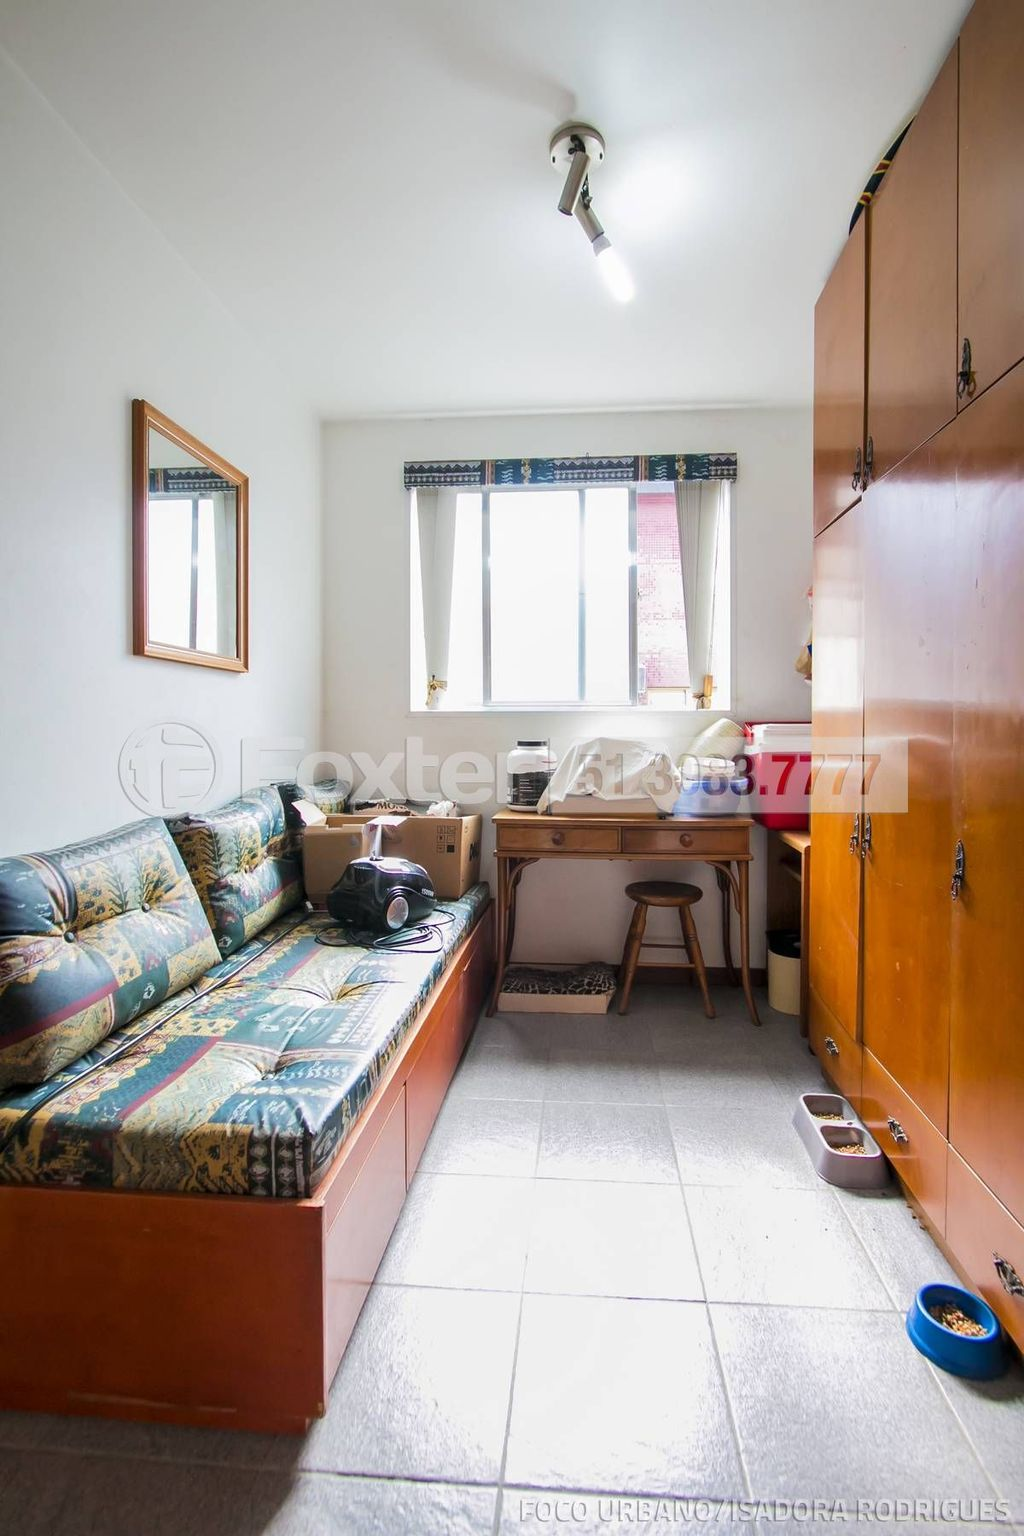 Foxter Imobiliária - Apto 4 Dorm, Mont Serrat - Foto 21